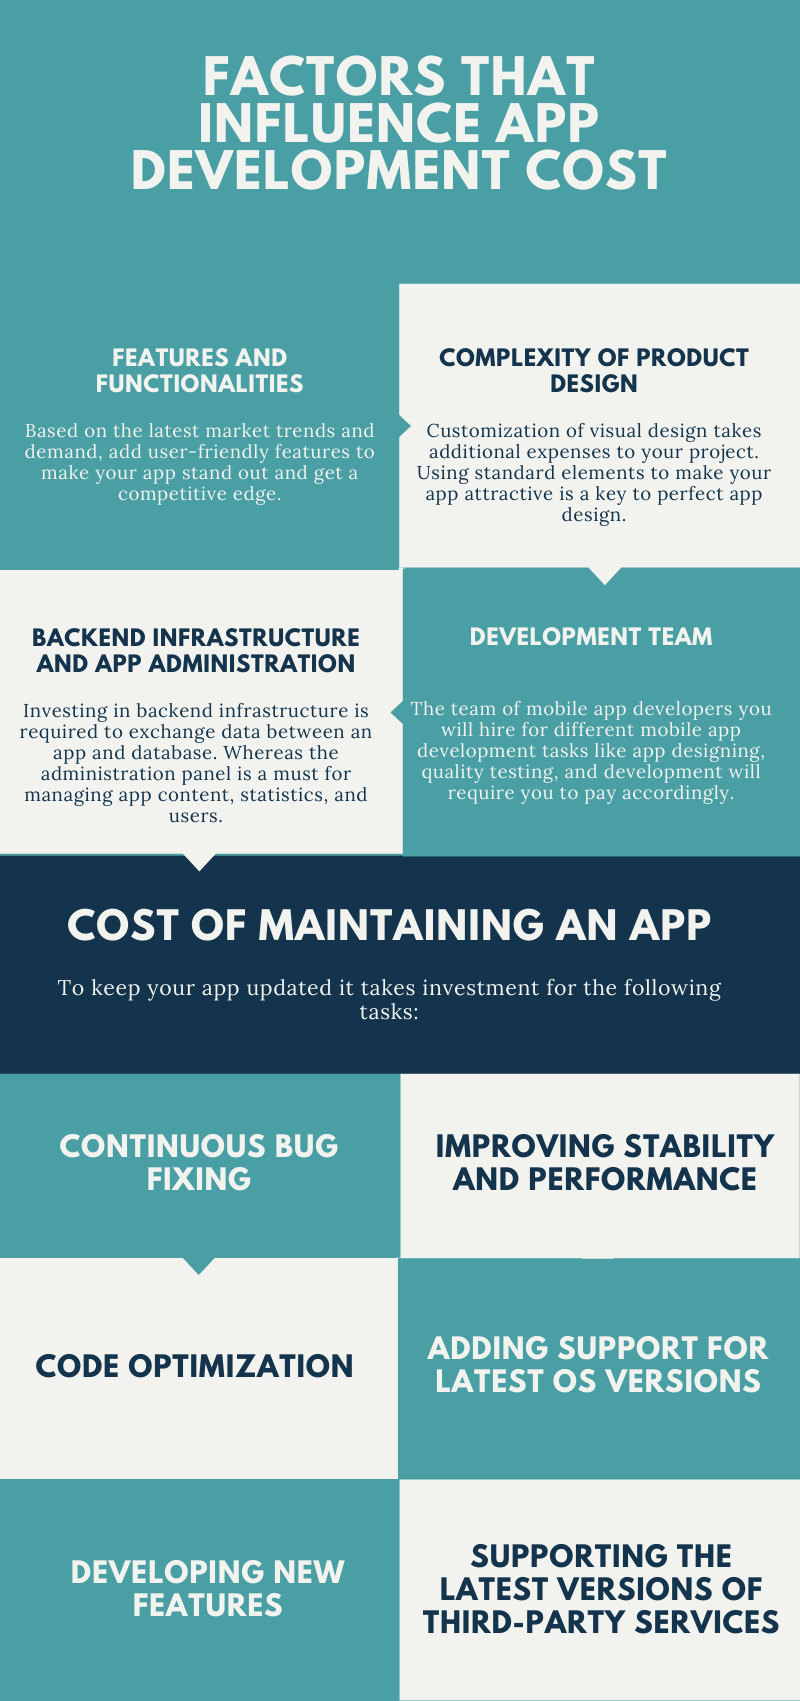 Factors that influence app development-cost